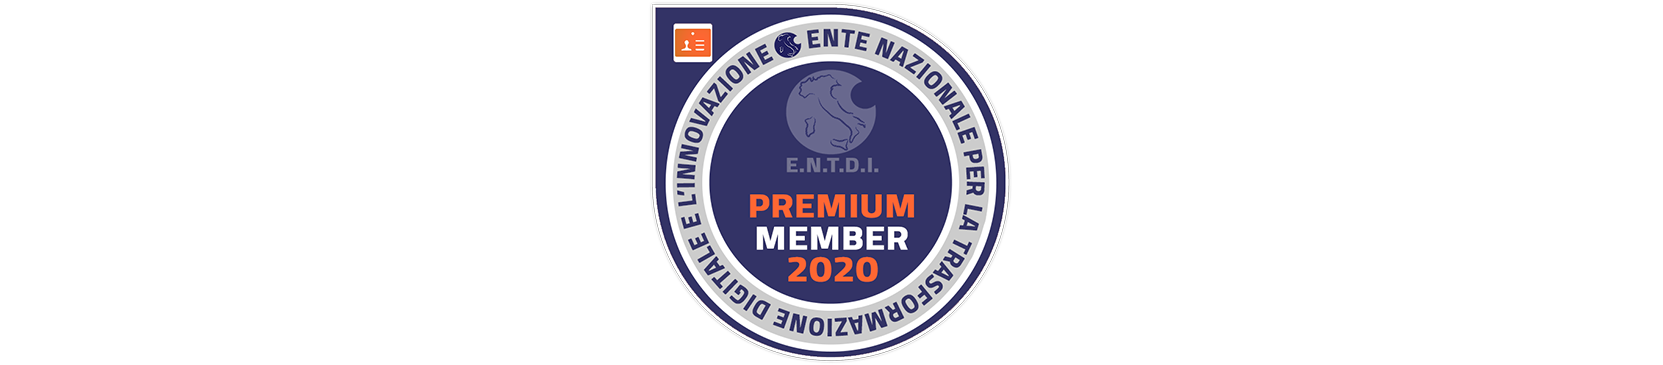 Premium Member ENTD